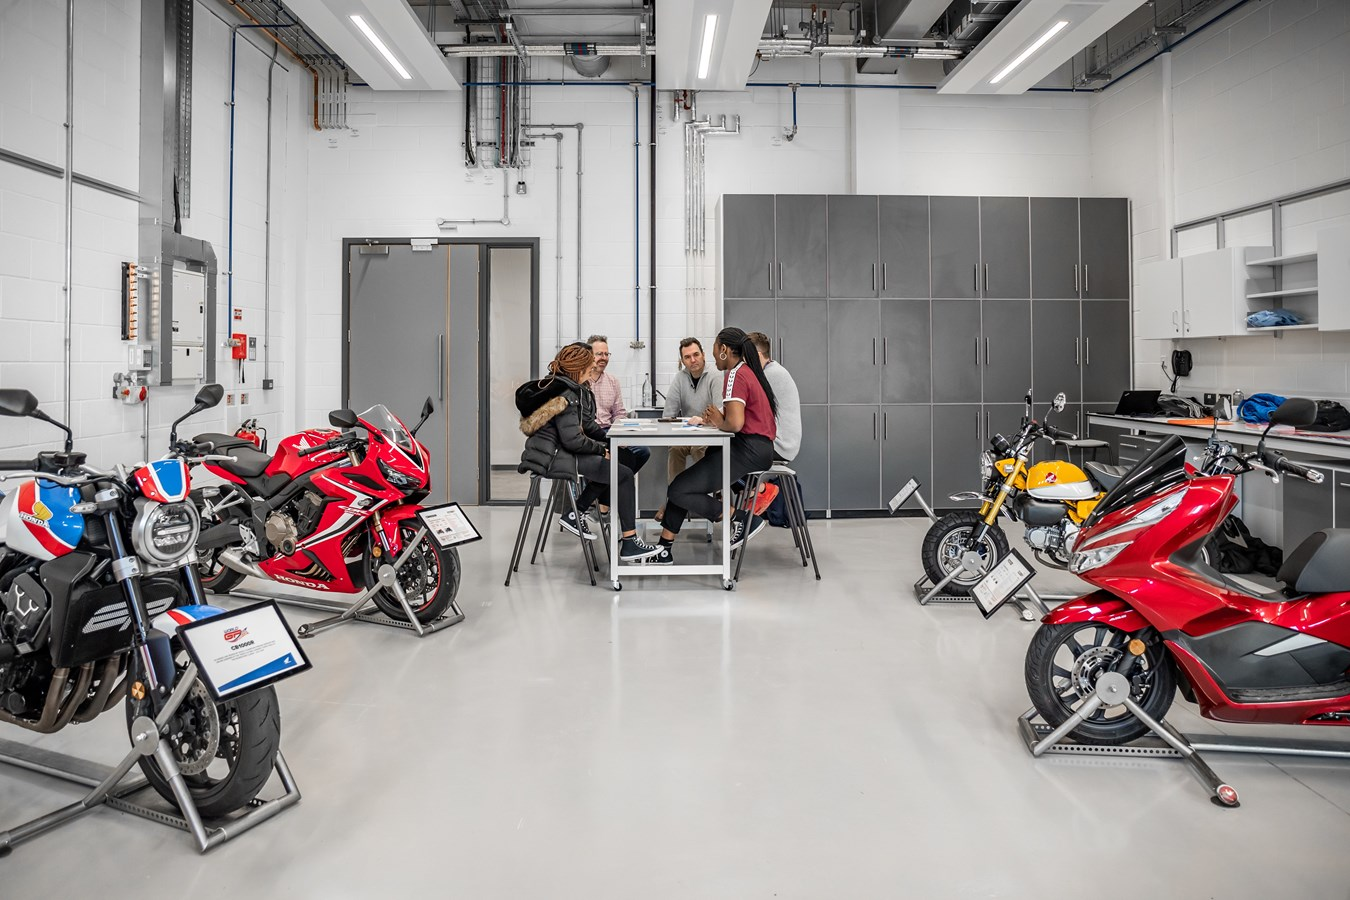 Honda UK collaborates with Nottingham Trent University to showcase motorcycles to students